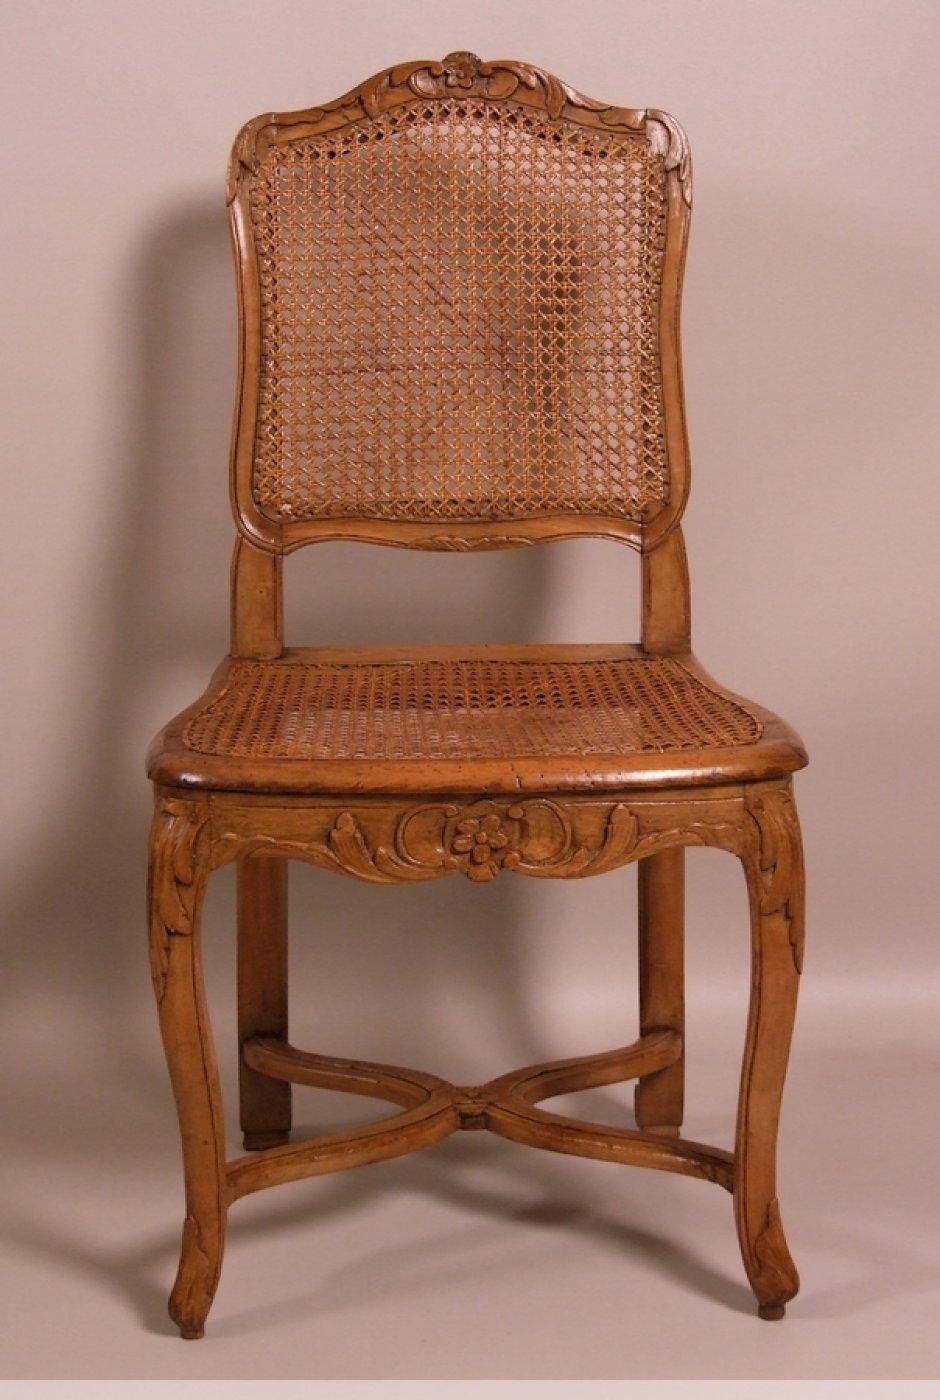 7 chaises cannees d epoque louis xv